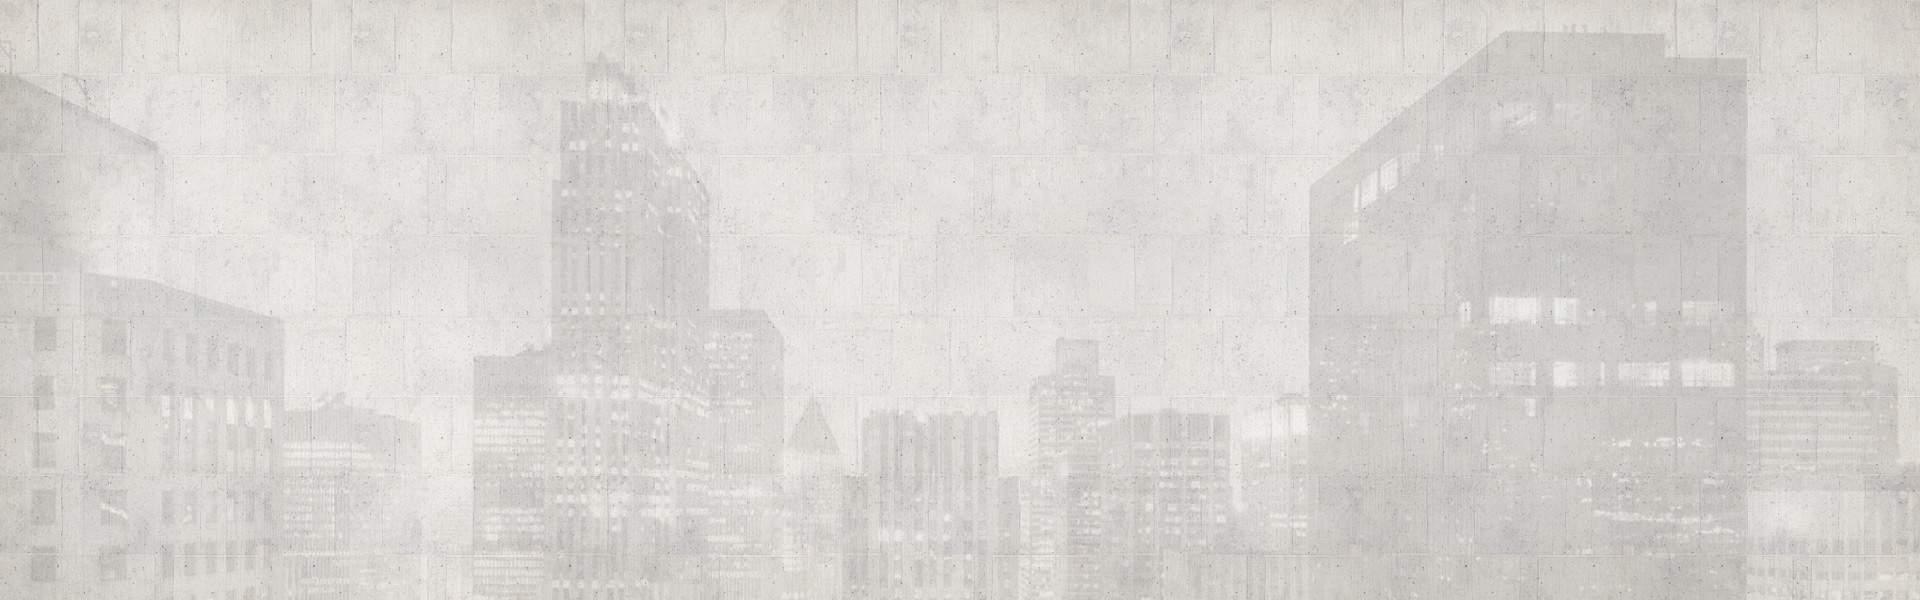 2013-12-Wallpaper-3D-116